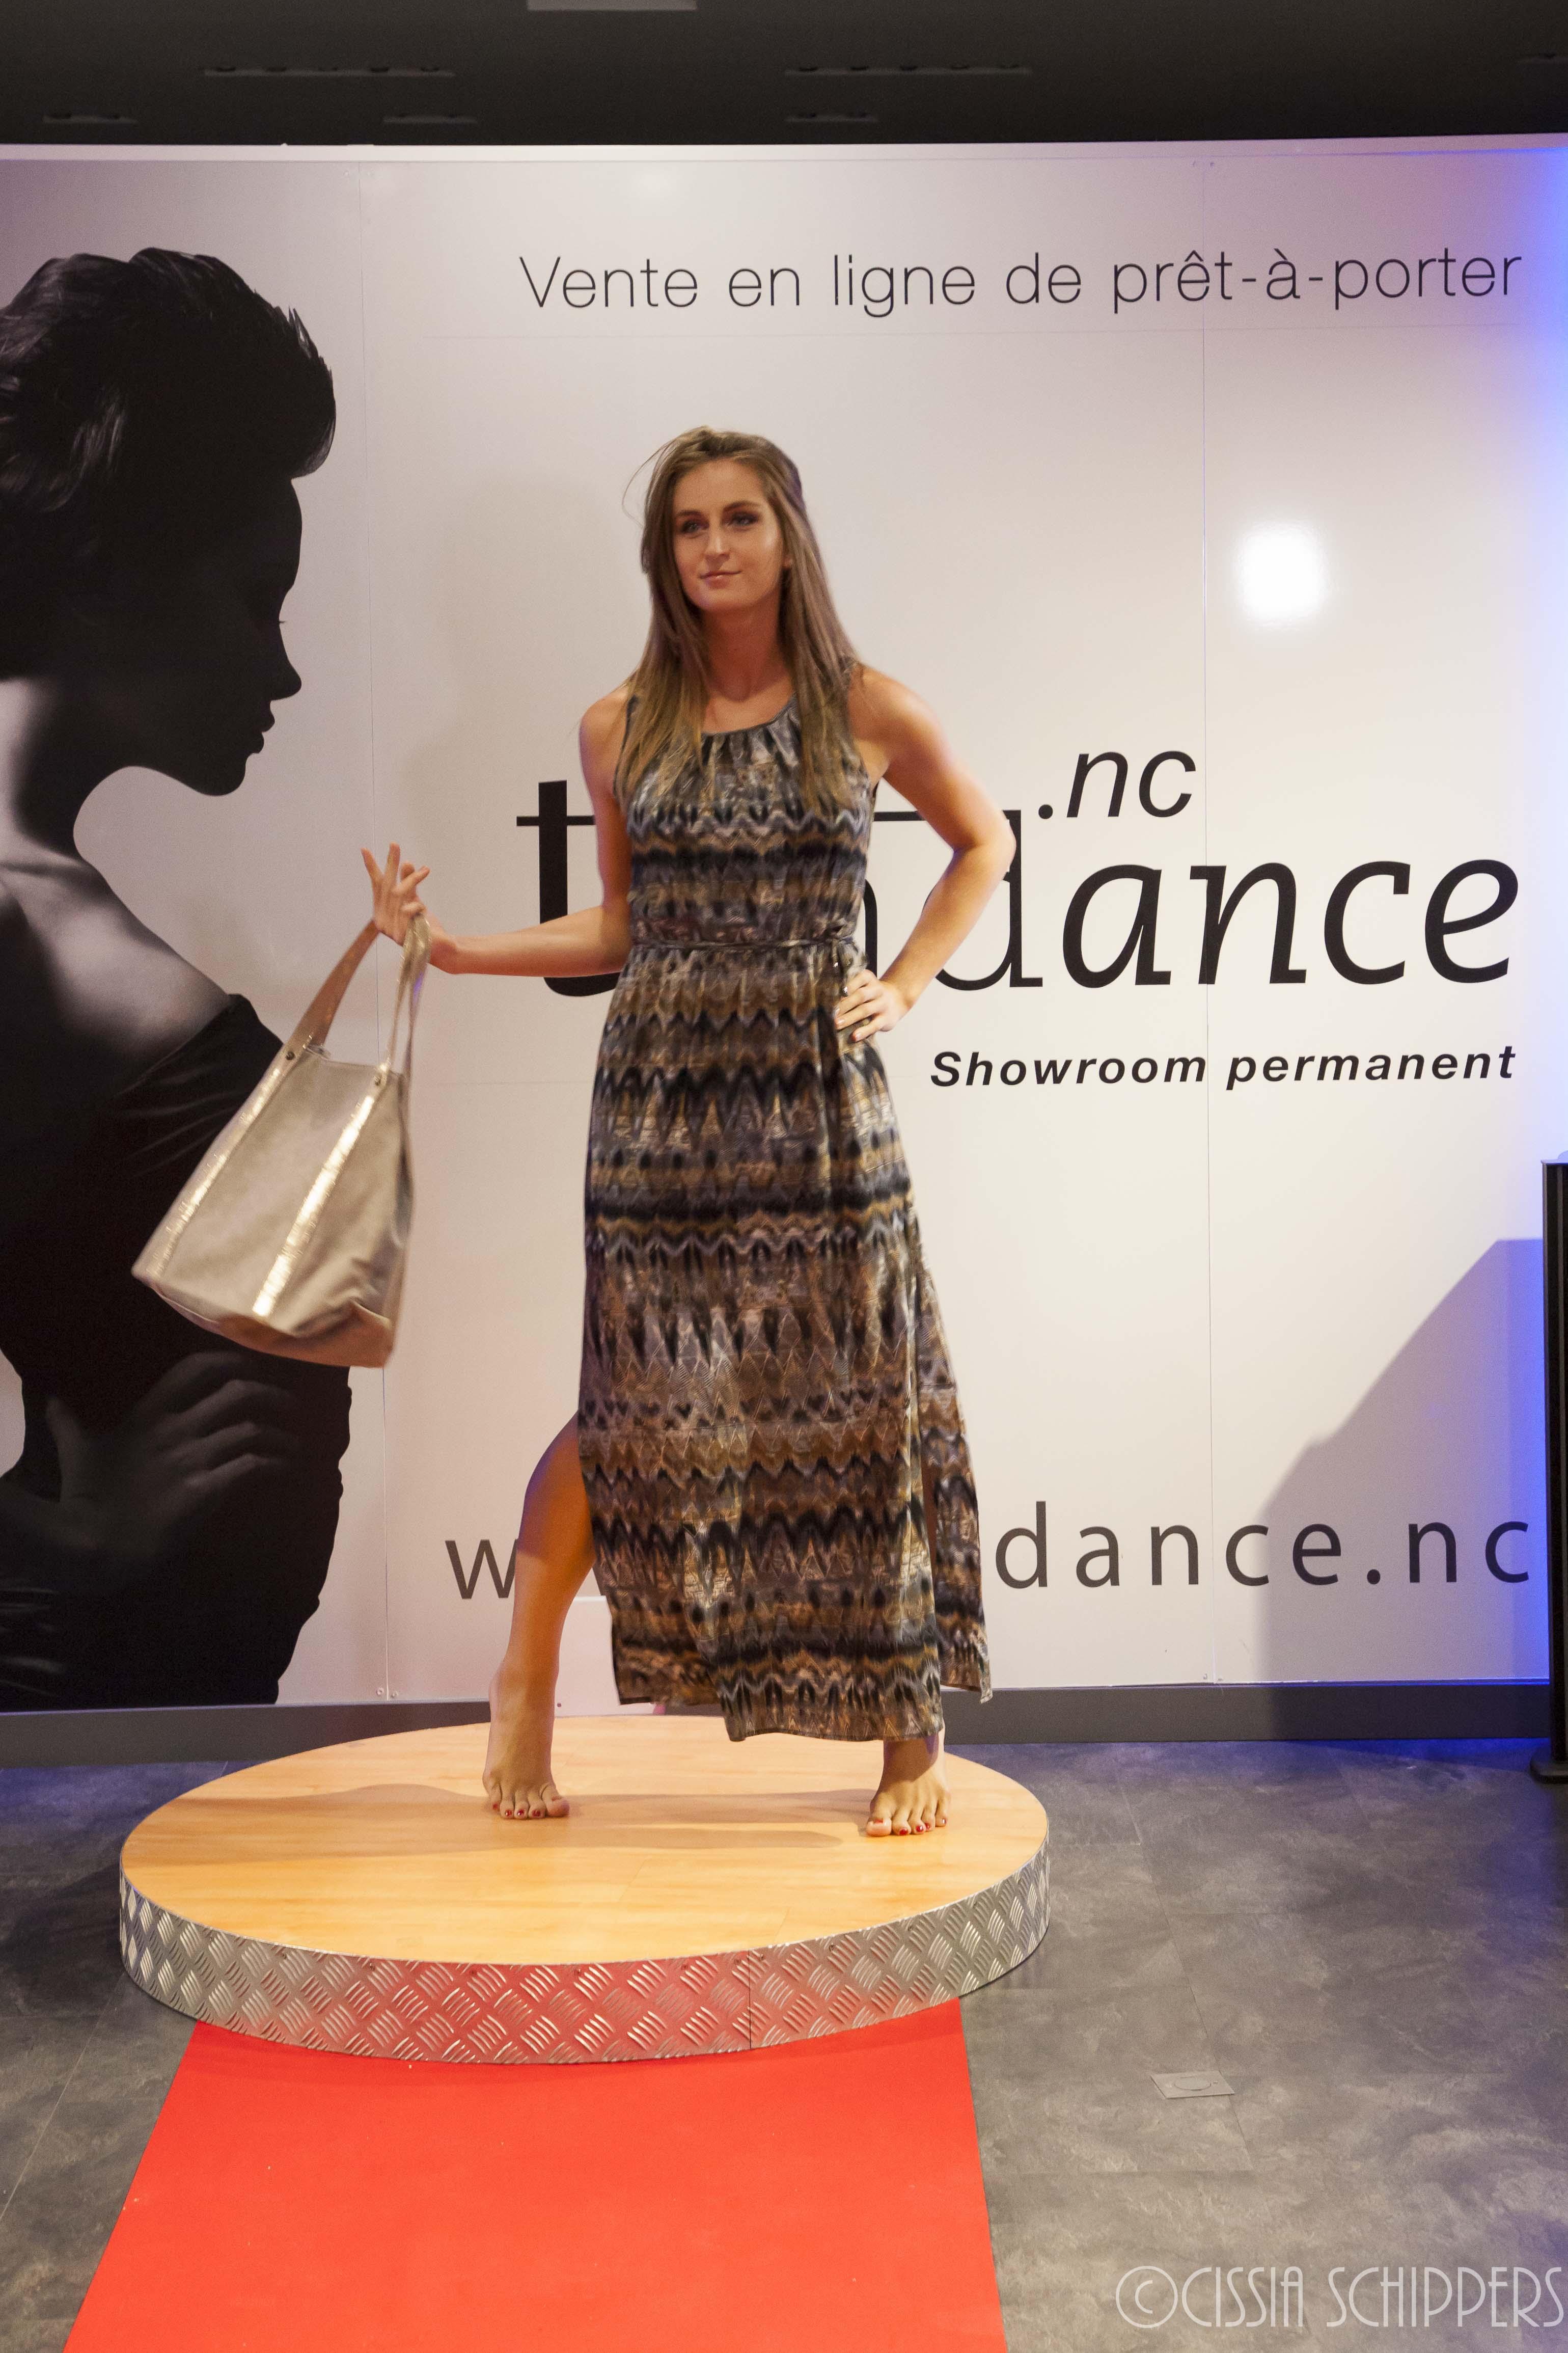 Tendance NC 2017 by Cissia Schippers photographe-7812